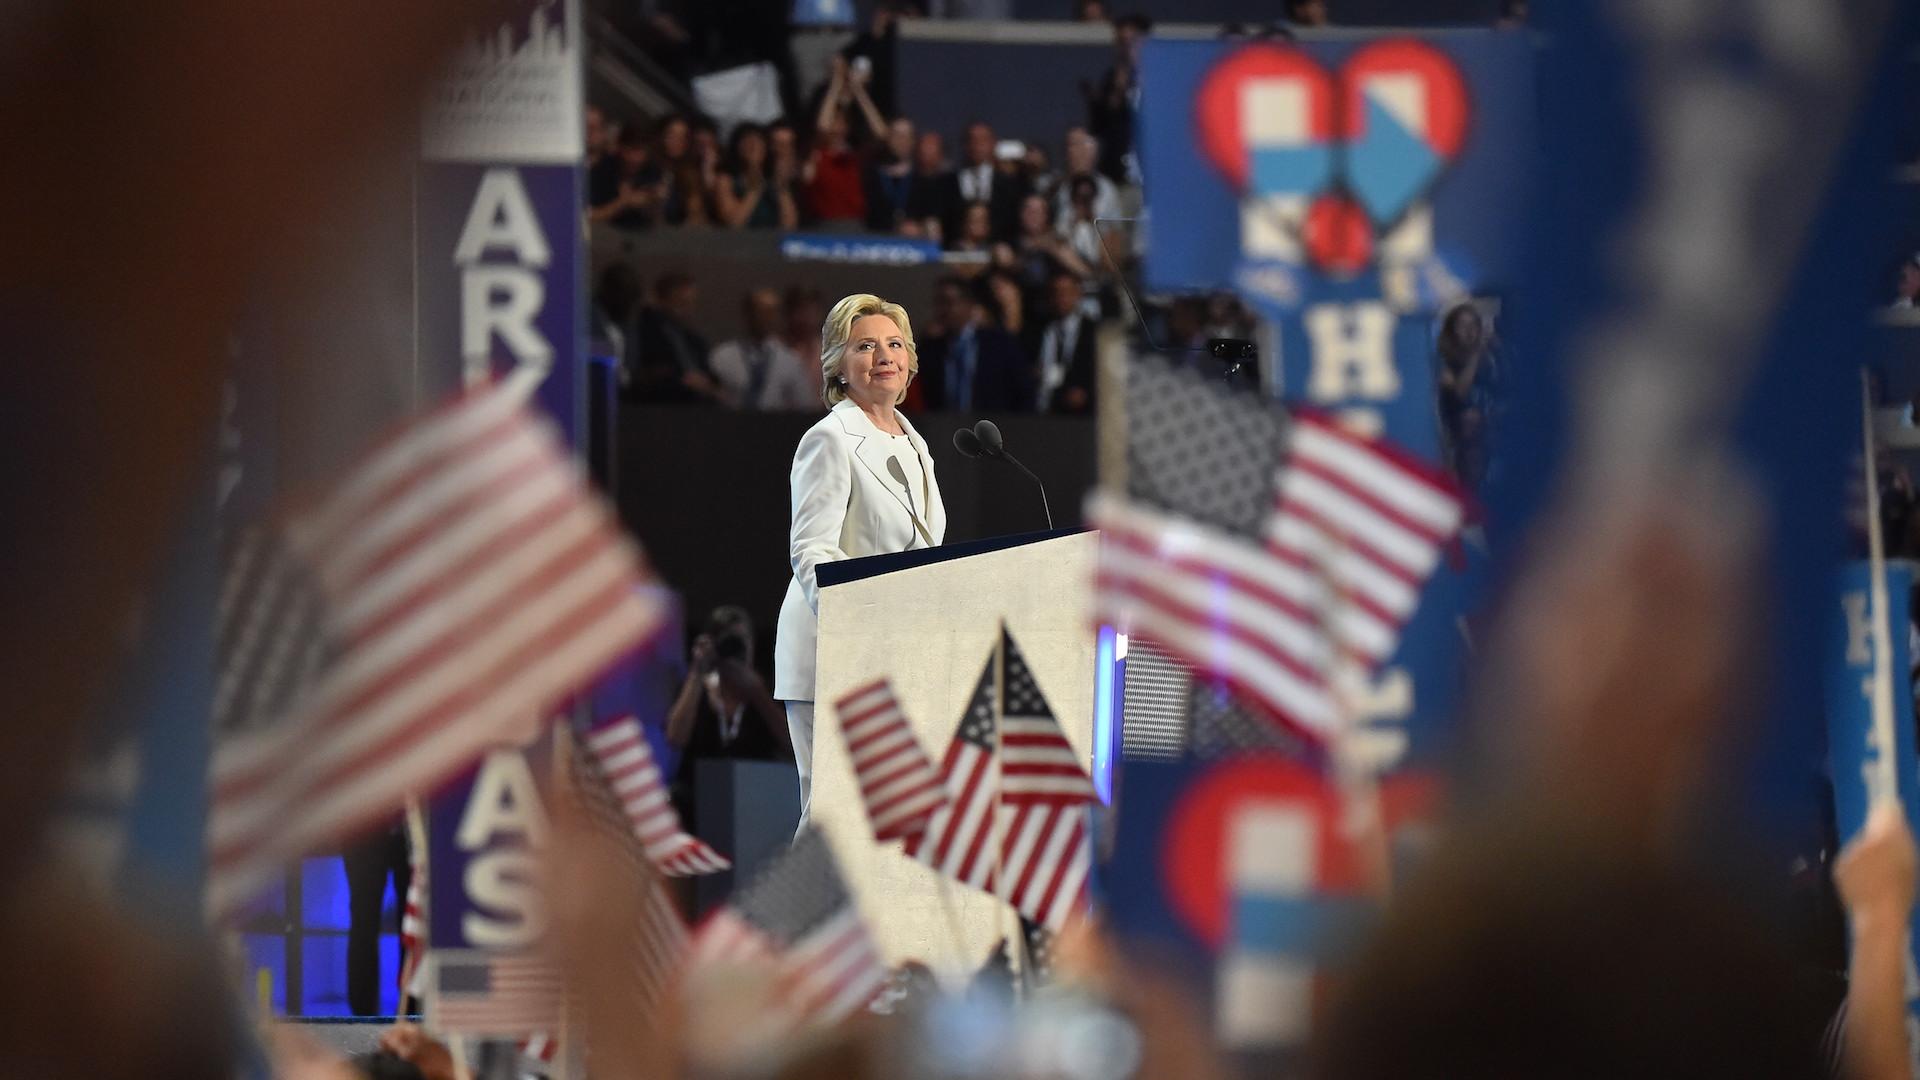 Fact-checking Hillary Clinton's acceptance speech at the 2016 DNC